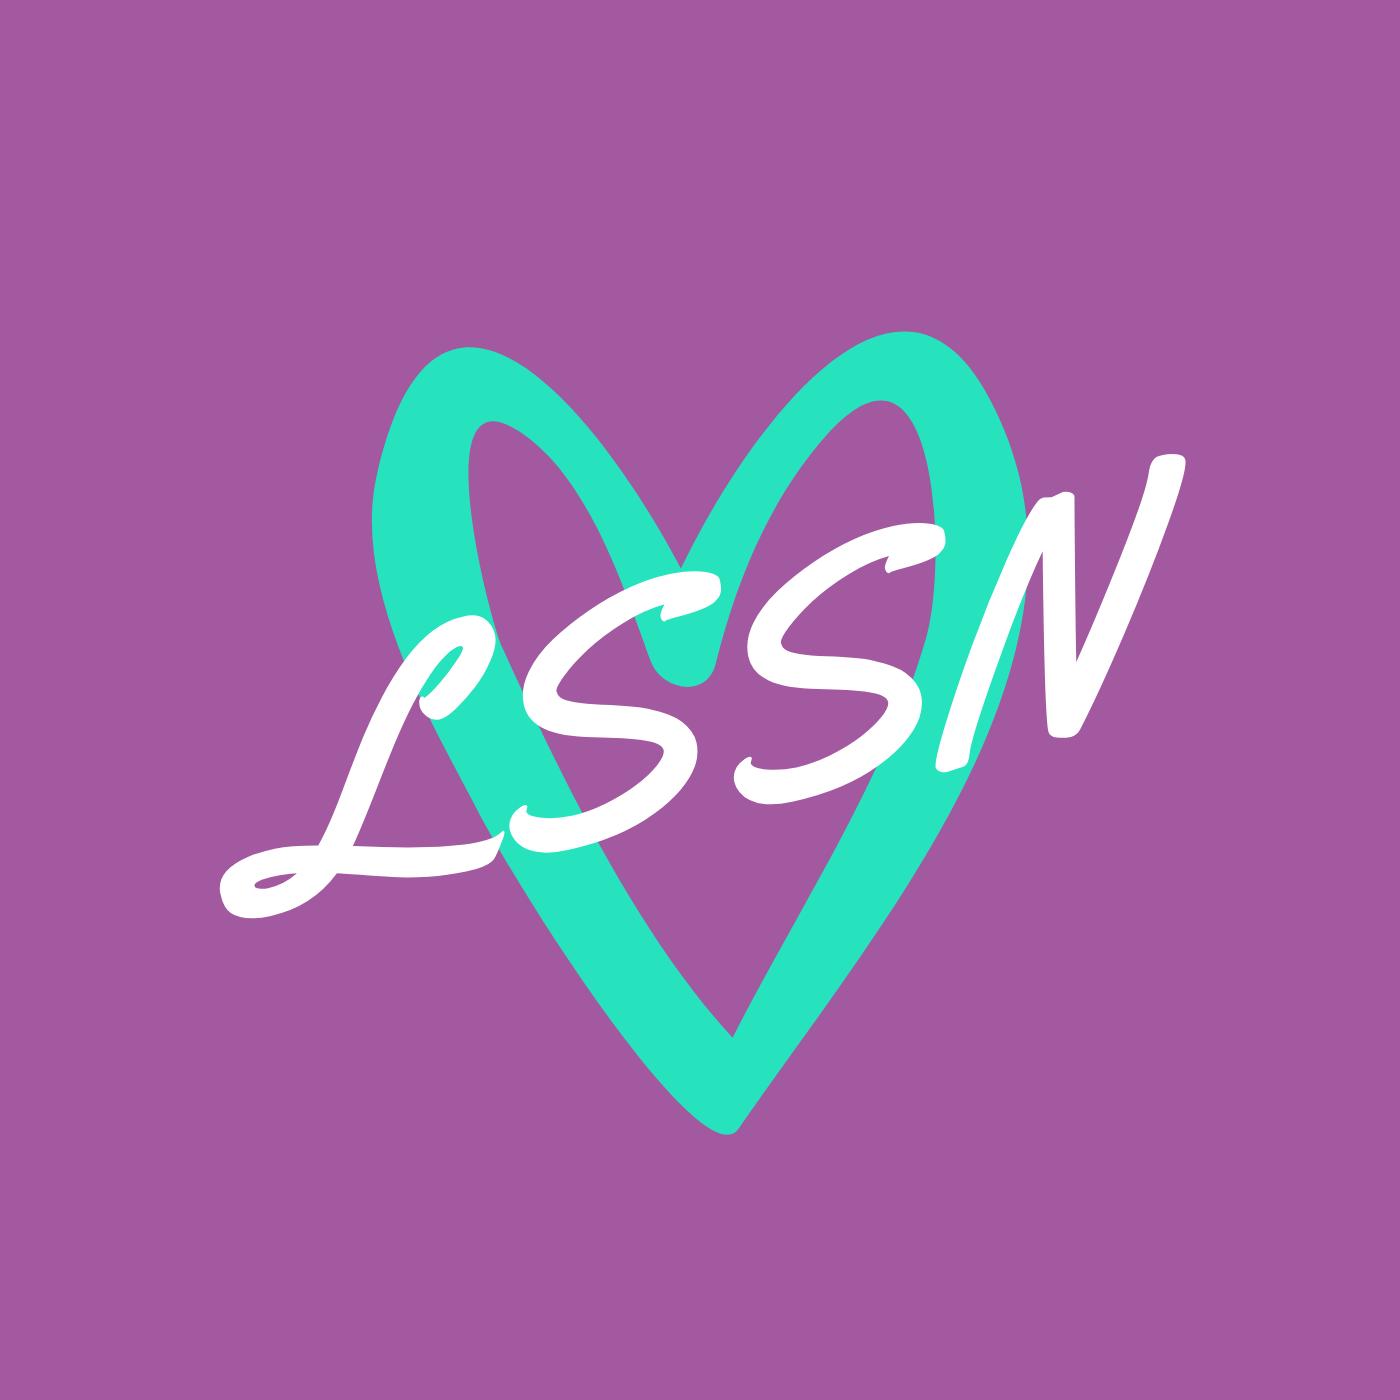 The Lichen Sclerosus Support Network!